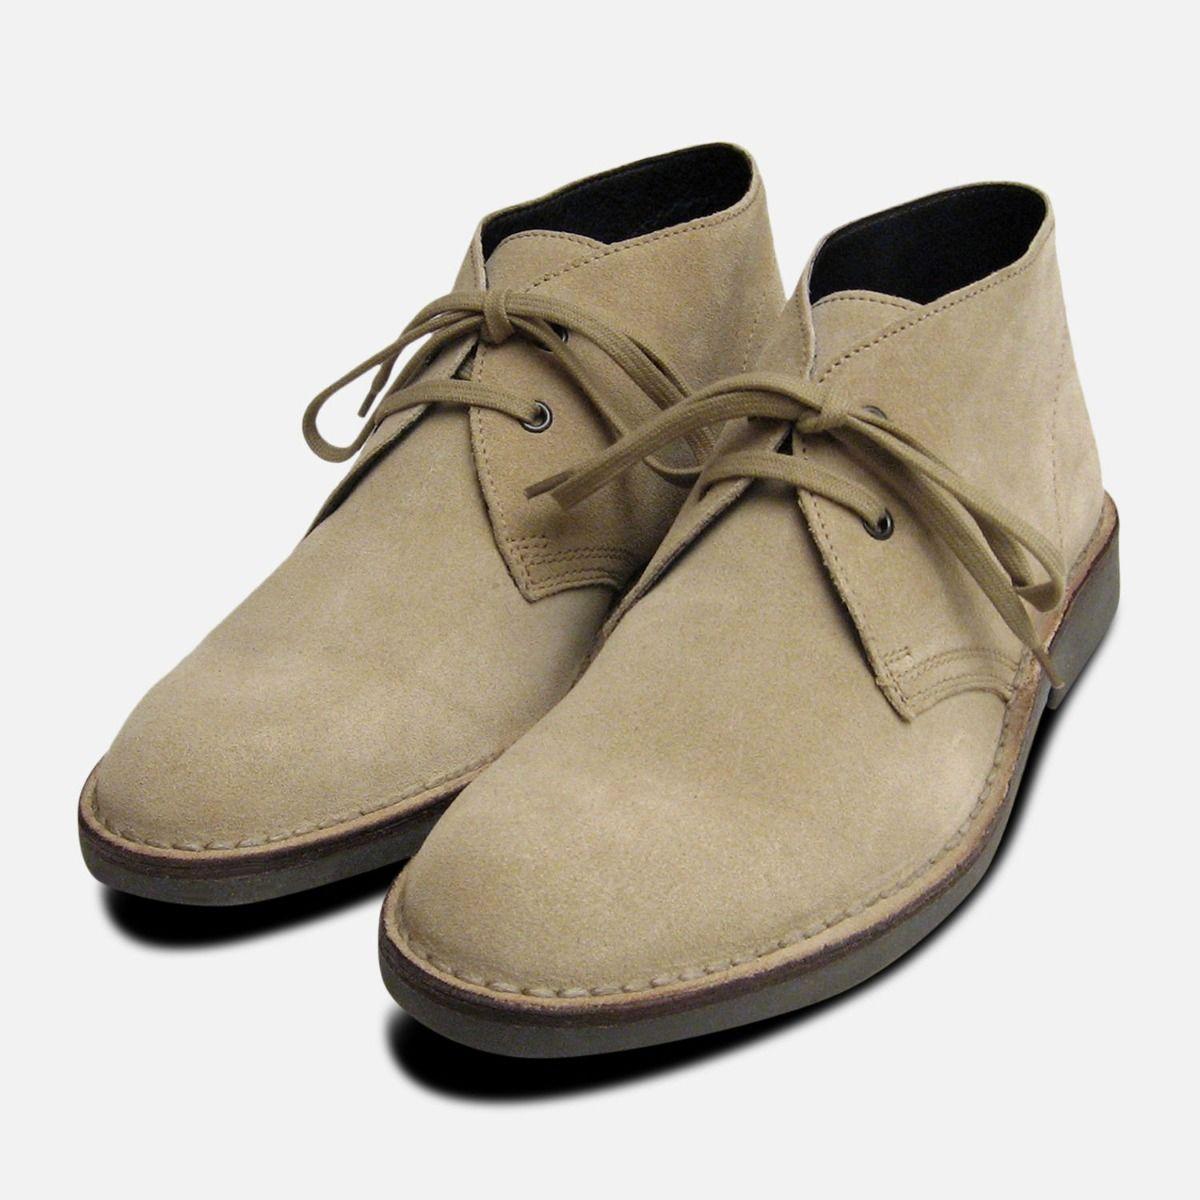 789685cfd17 Original Sand Suede Mens Italian Desert Boots